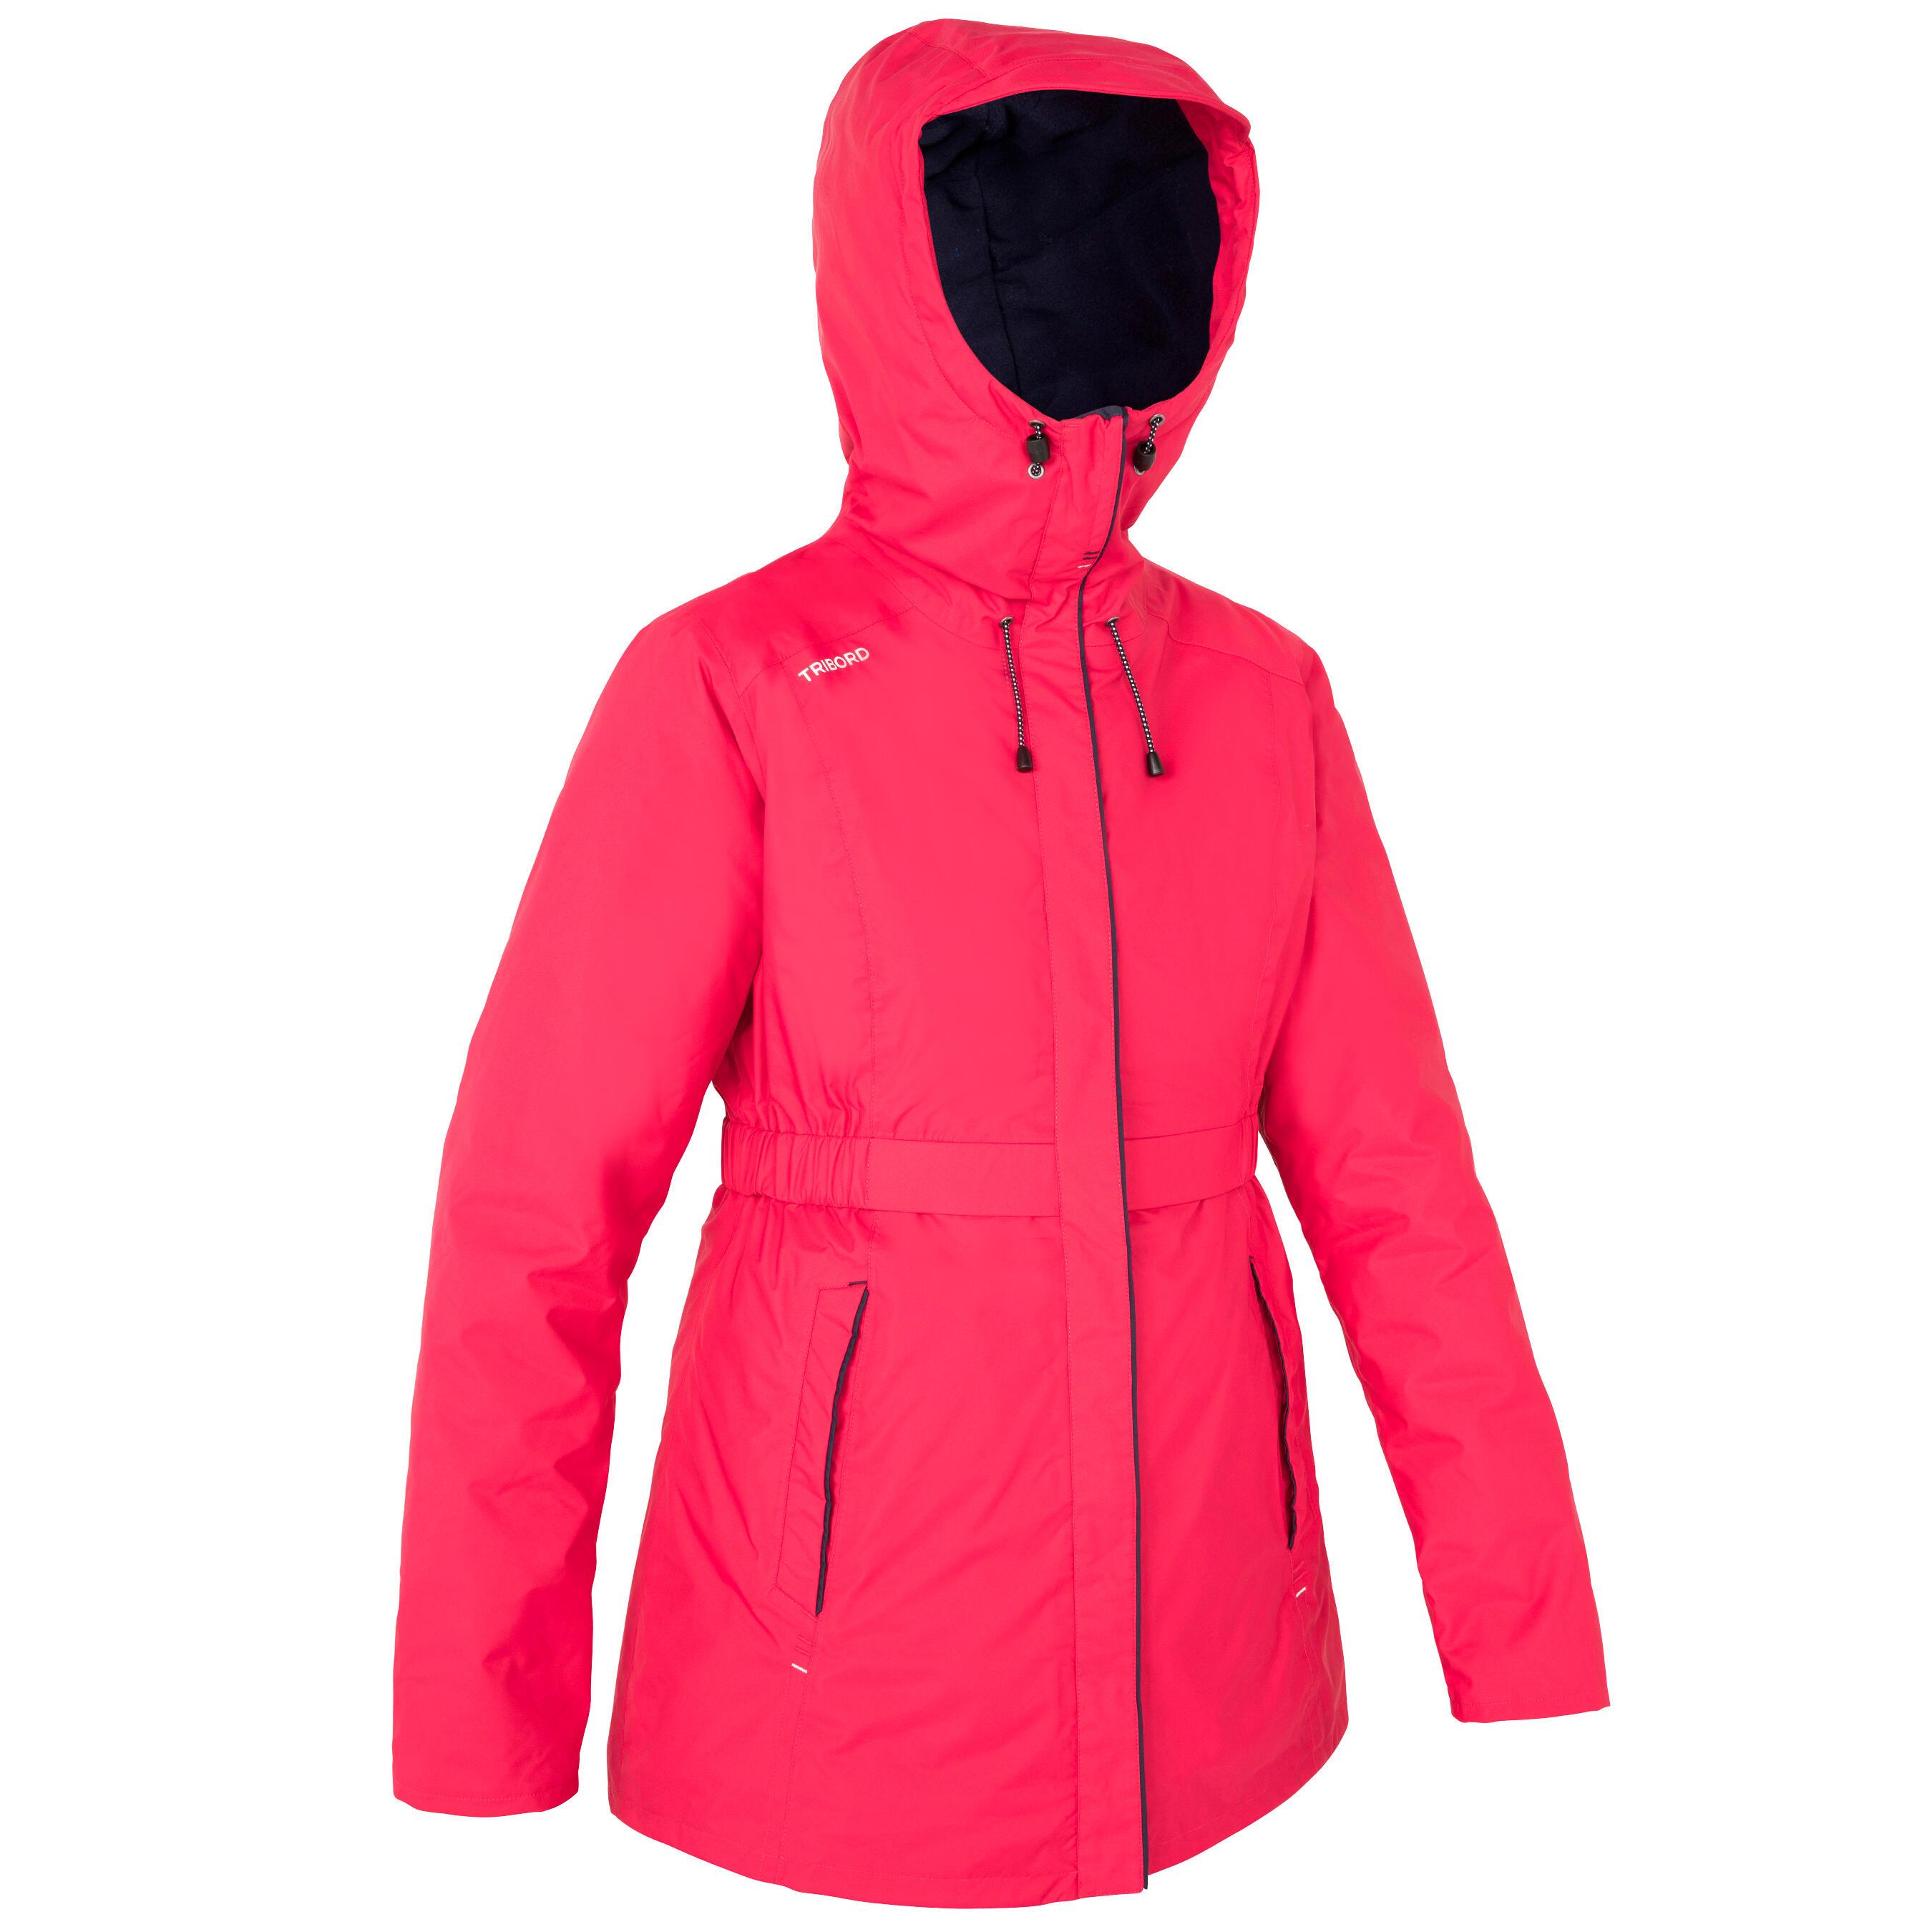 Segeljacke warm 100 Damen rosa | Sportbekleidung > Sportjacken > Sonstige Sportjacken | Rosa | Tribord